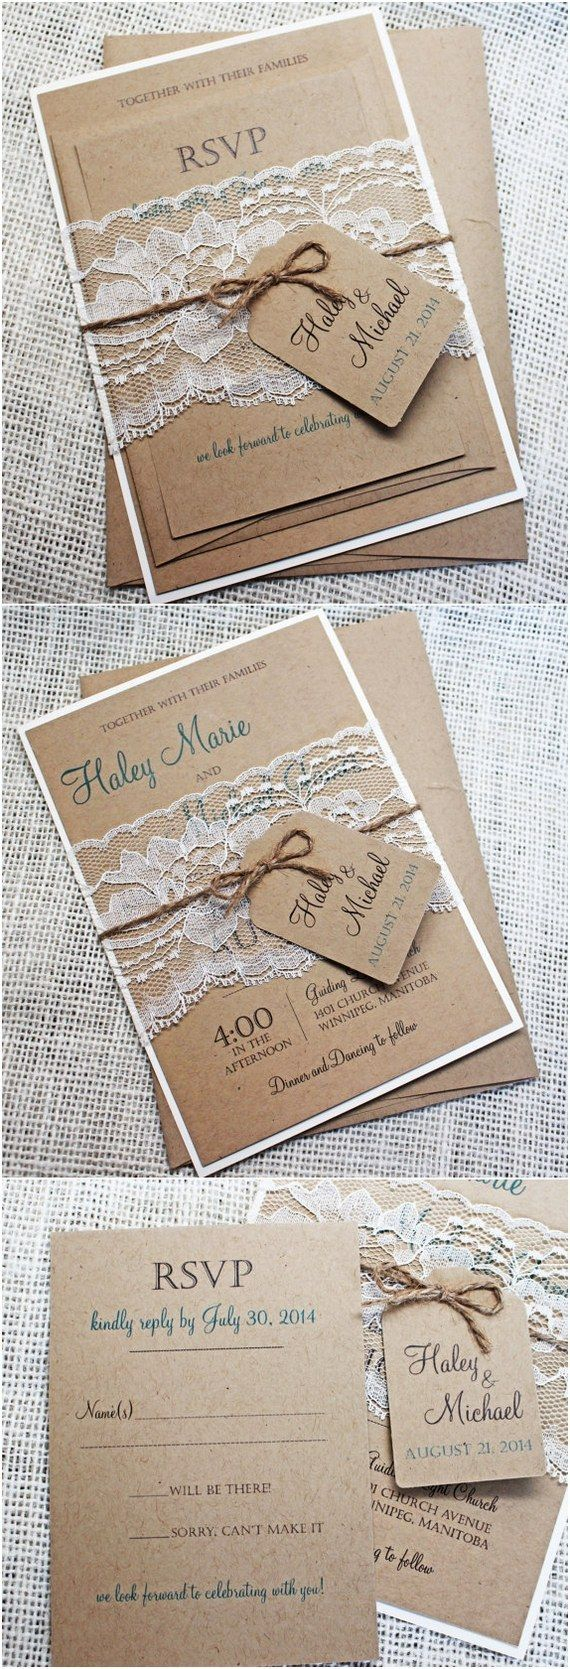 Rustic Lace Wedding Invitations 15 Rustic Wedding Invitations From Etsy Rustic Wedding Ideas